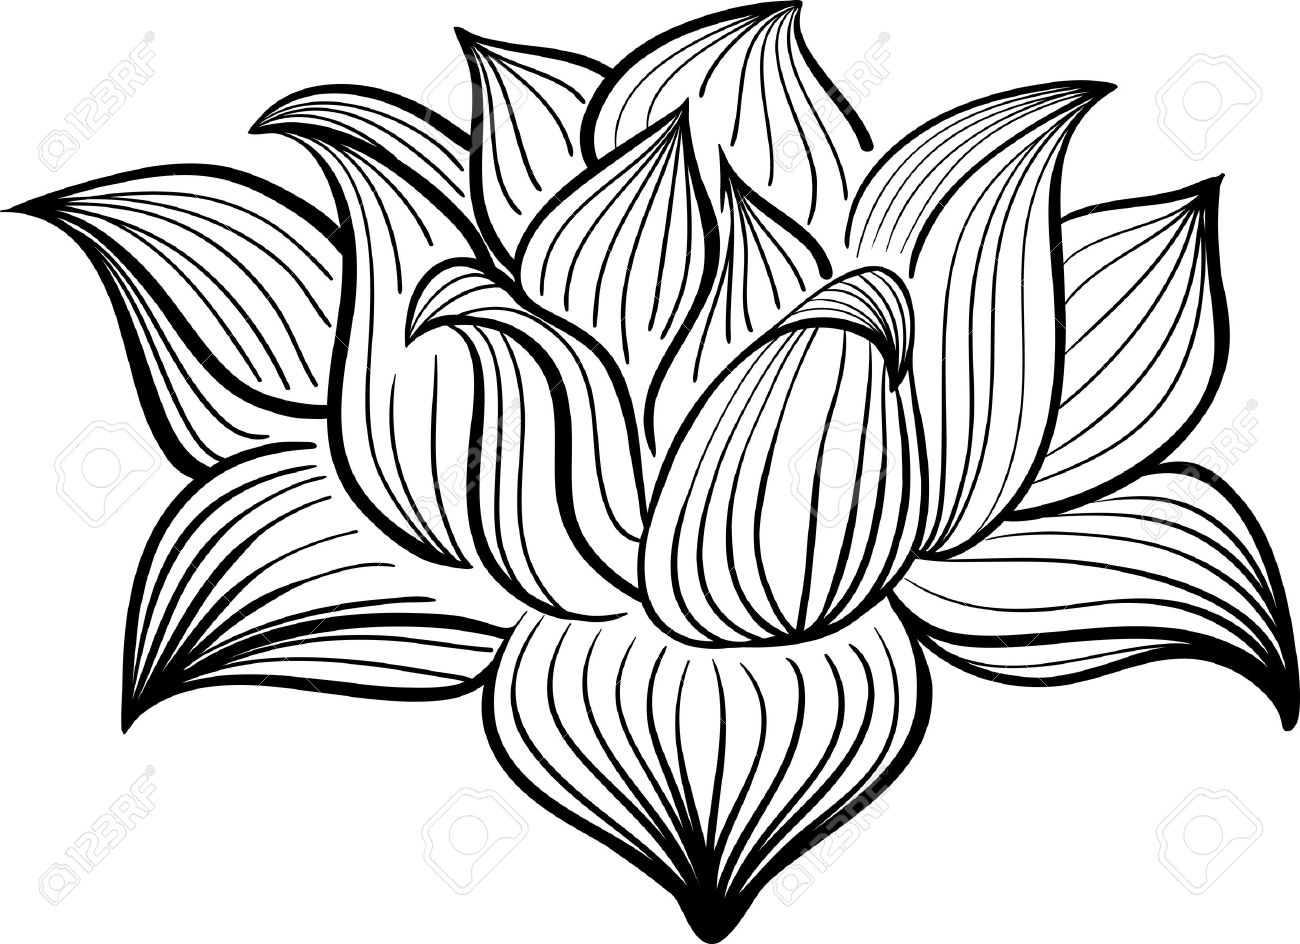 1300x944 Lotus Flower Line Drawing Free Download Clip Art